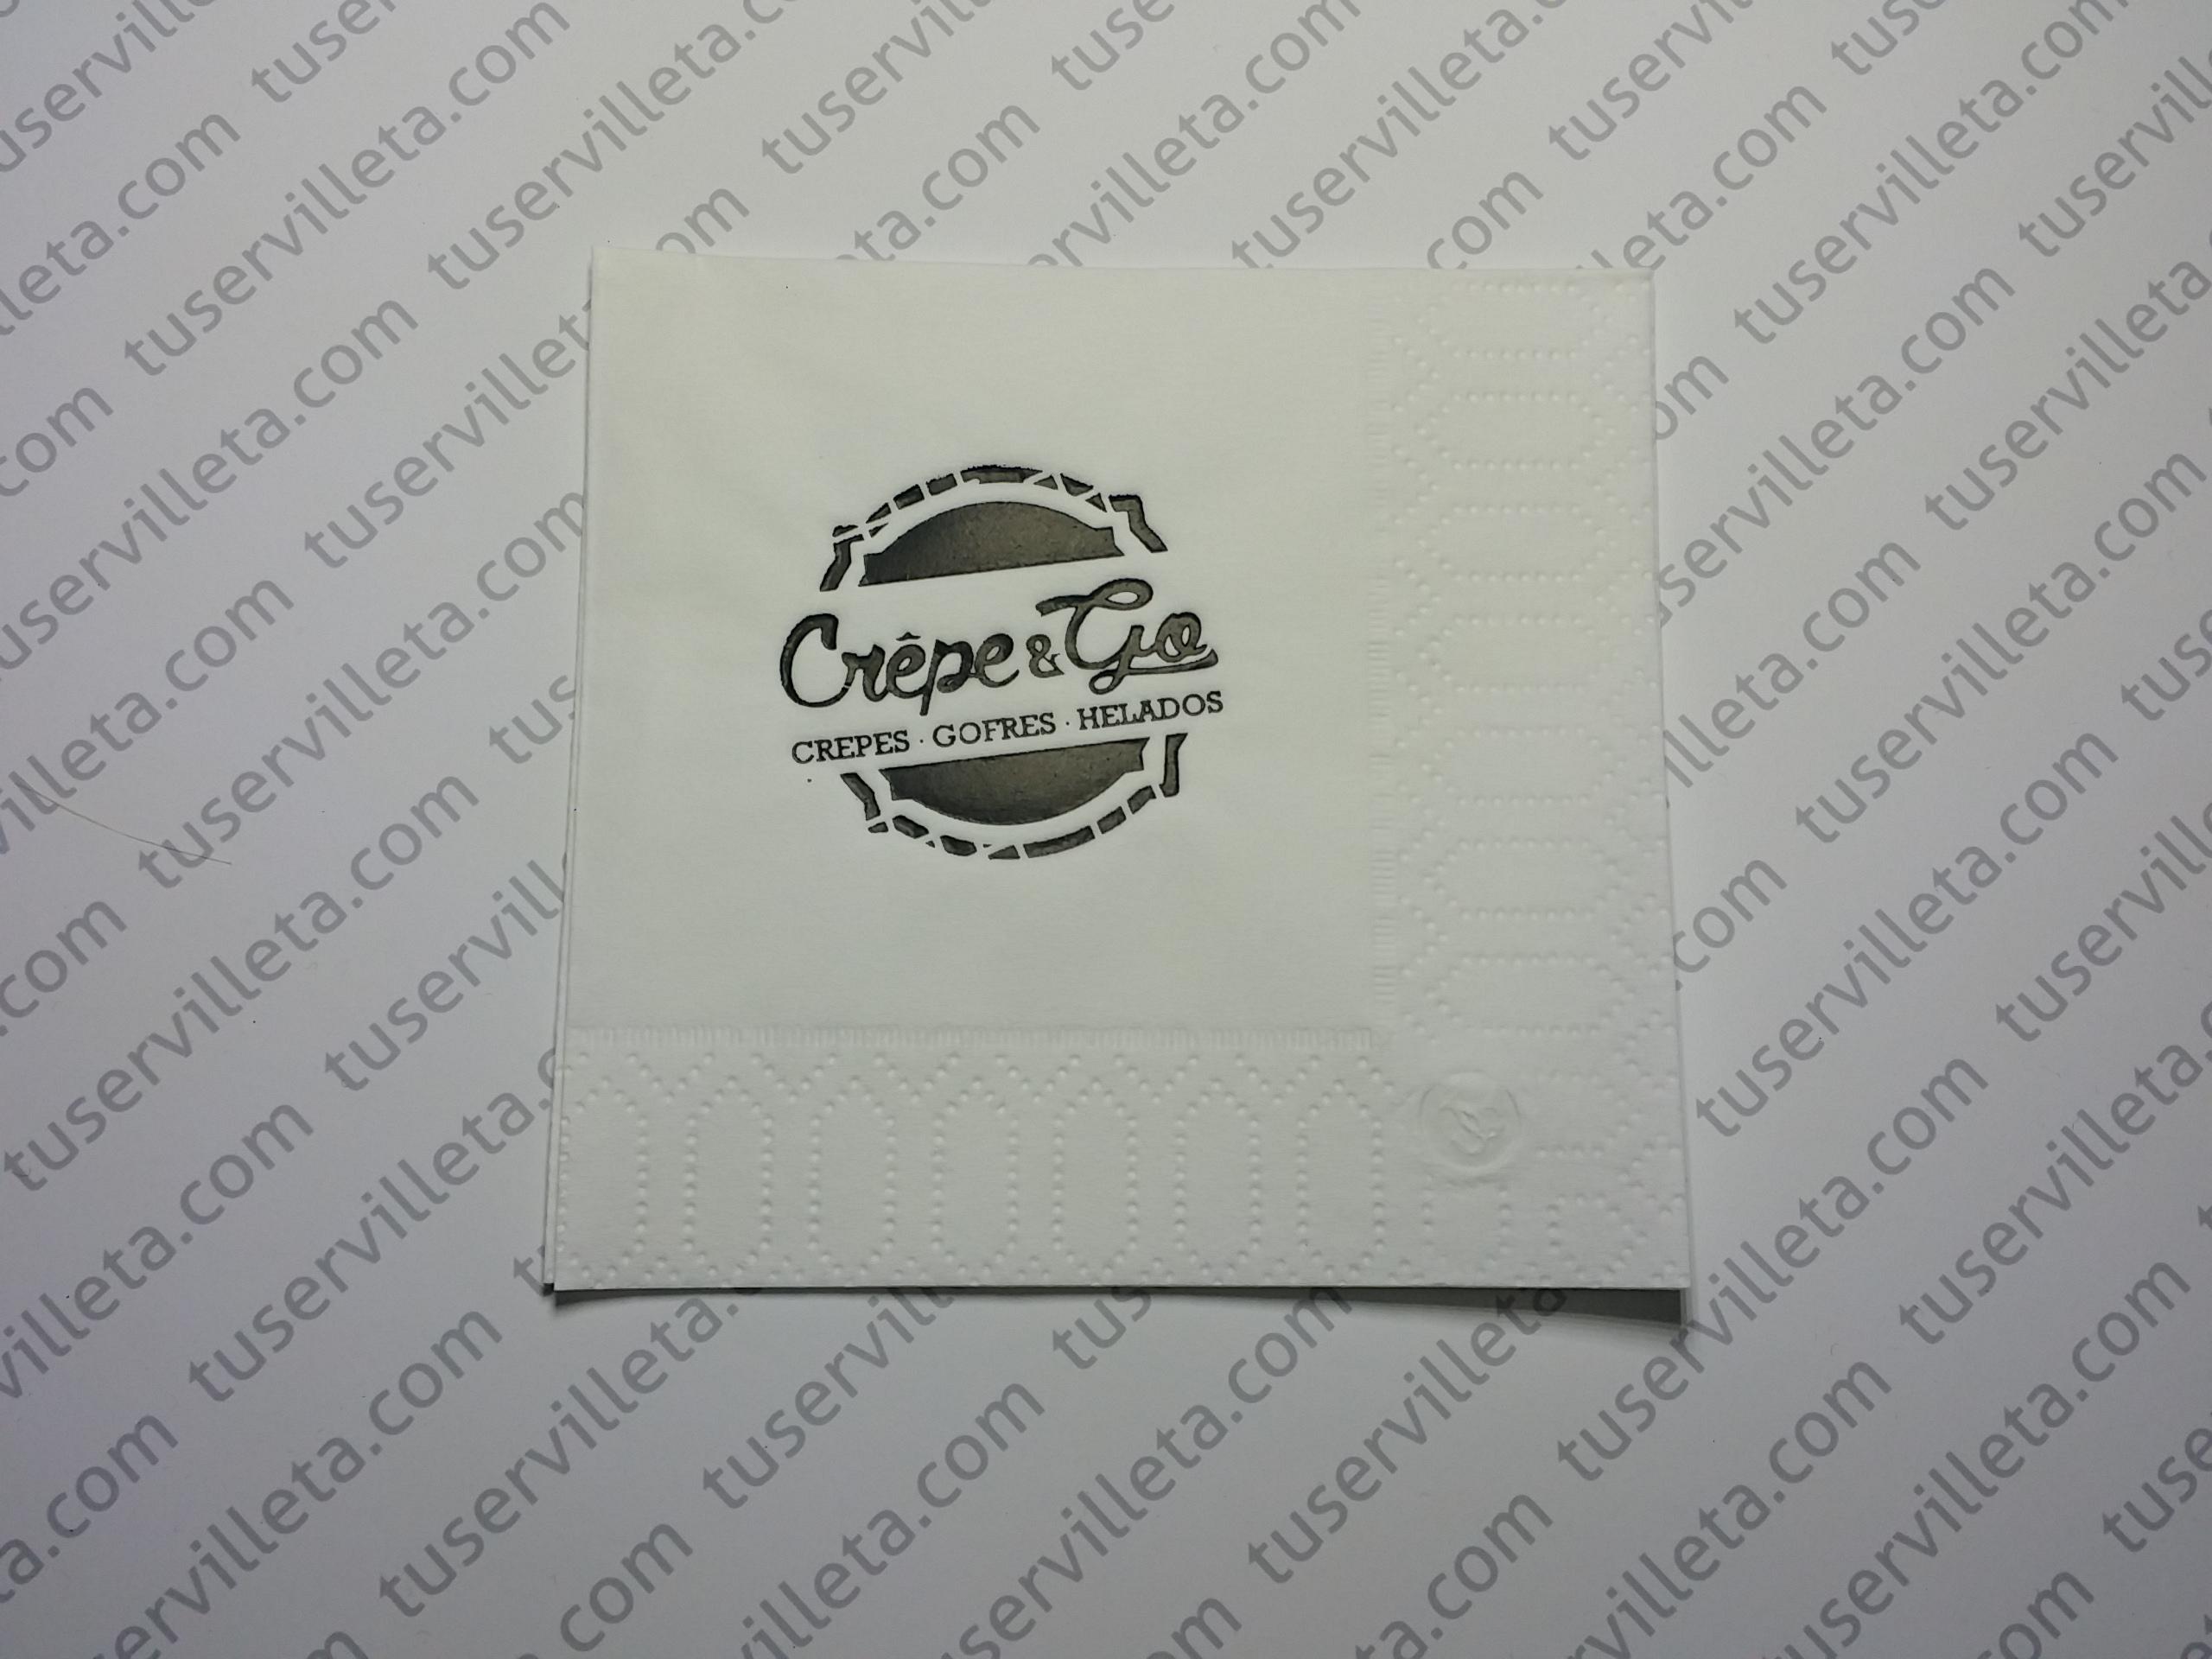 Servilleta Impresa Crepe & Go